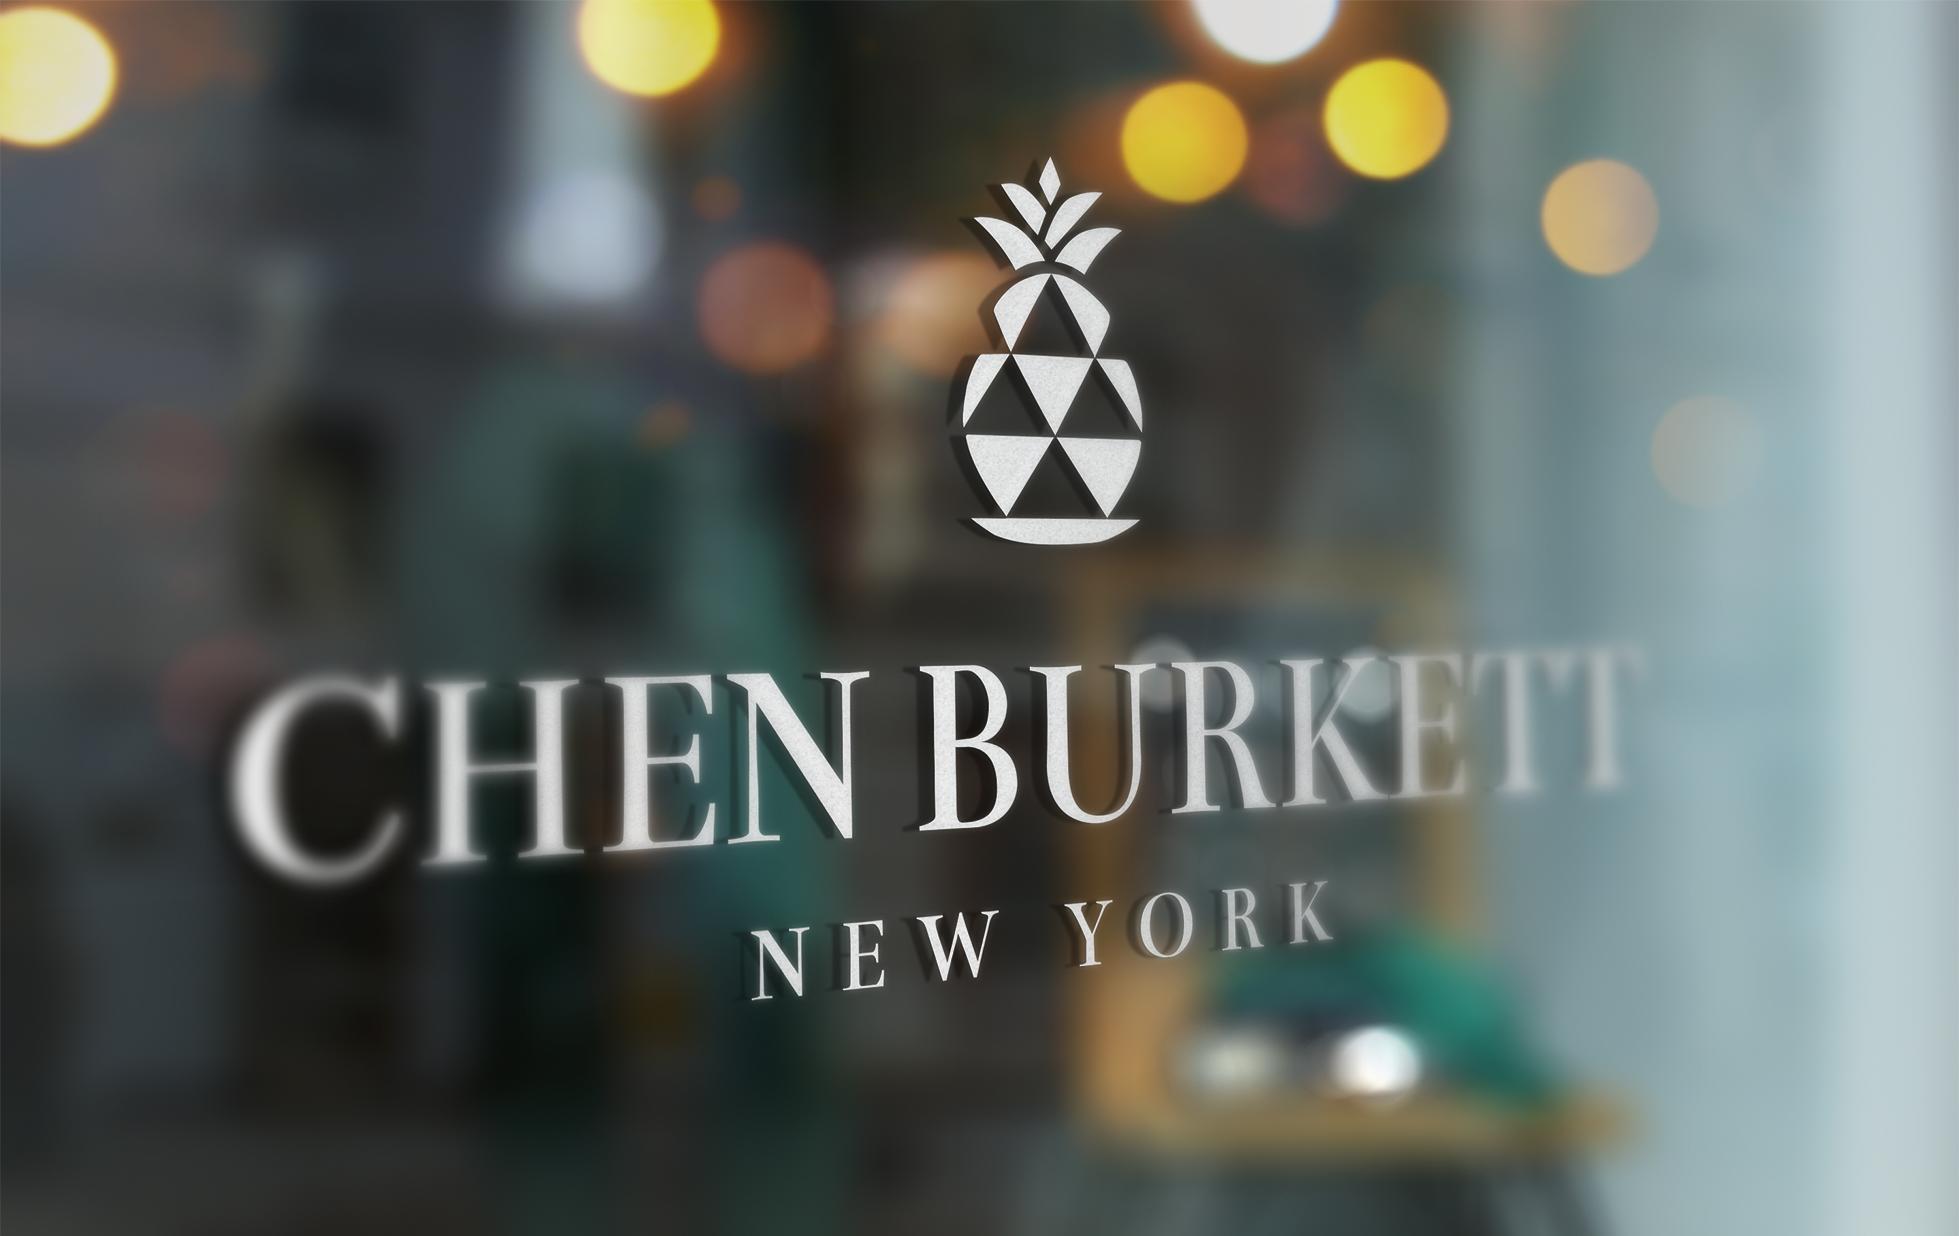 Chen Burkett New York